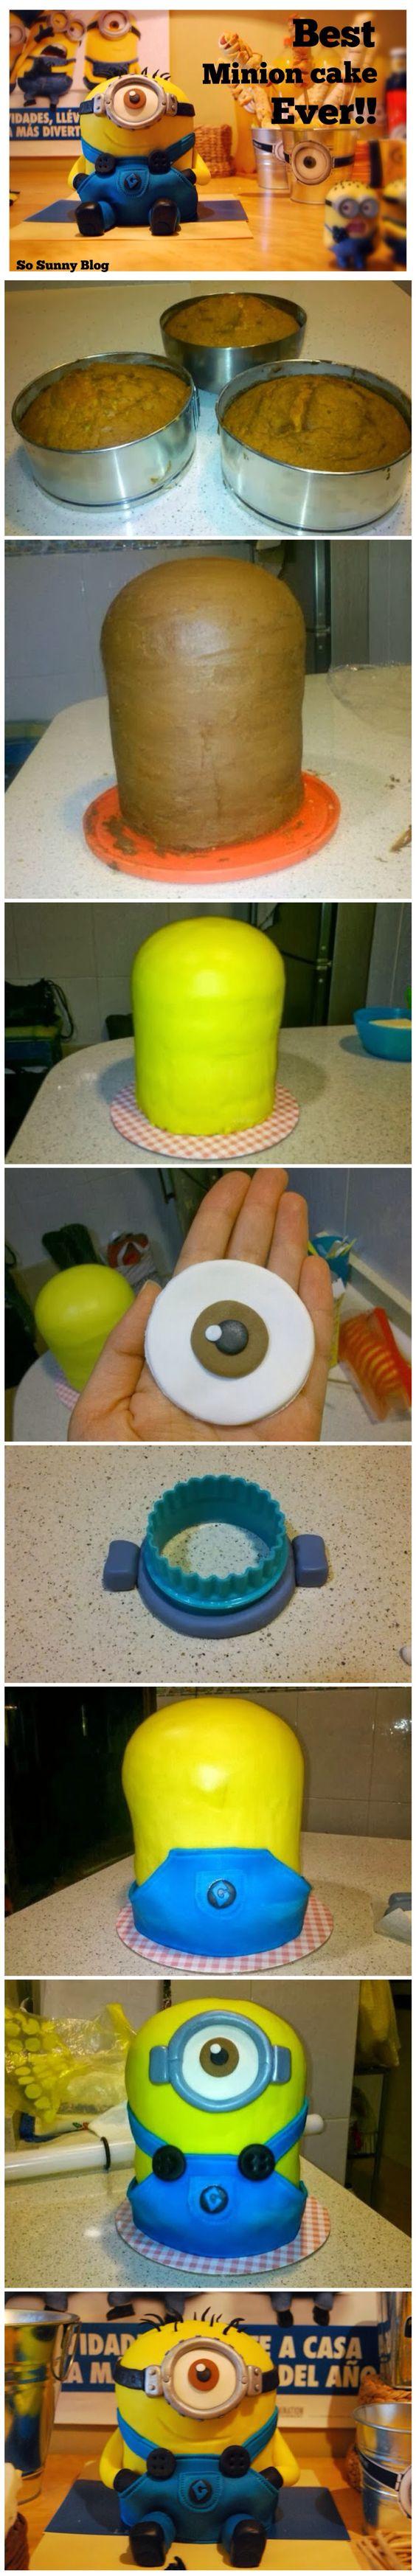 http://sosunnyblog.blogspot.com.es/2013/12/so-sunny-by-paula-tarta-minion-hecha.html DIY Despicable me cake tutorial. Tutorial completo tarta Minion